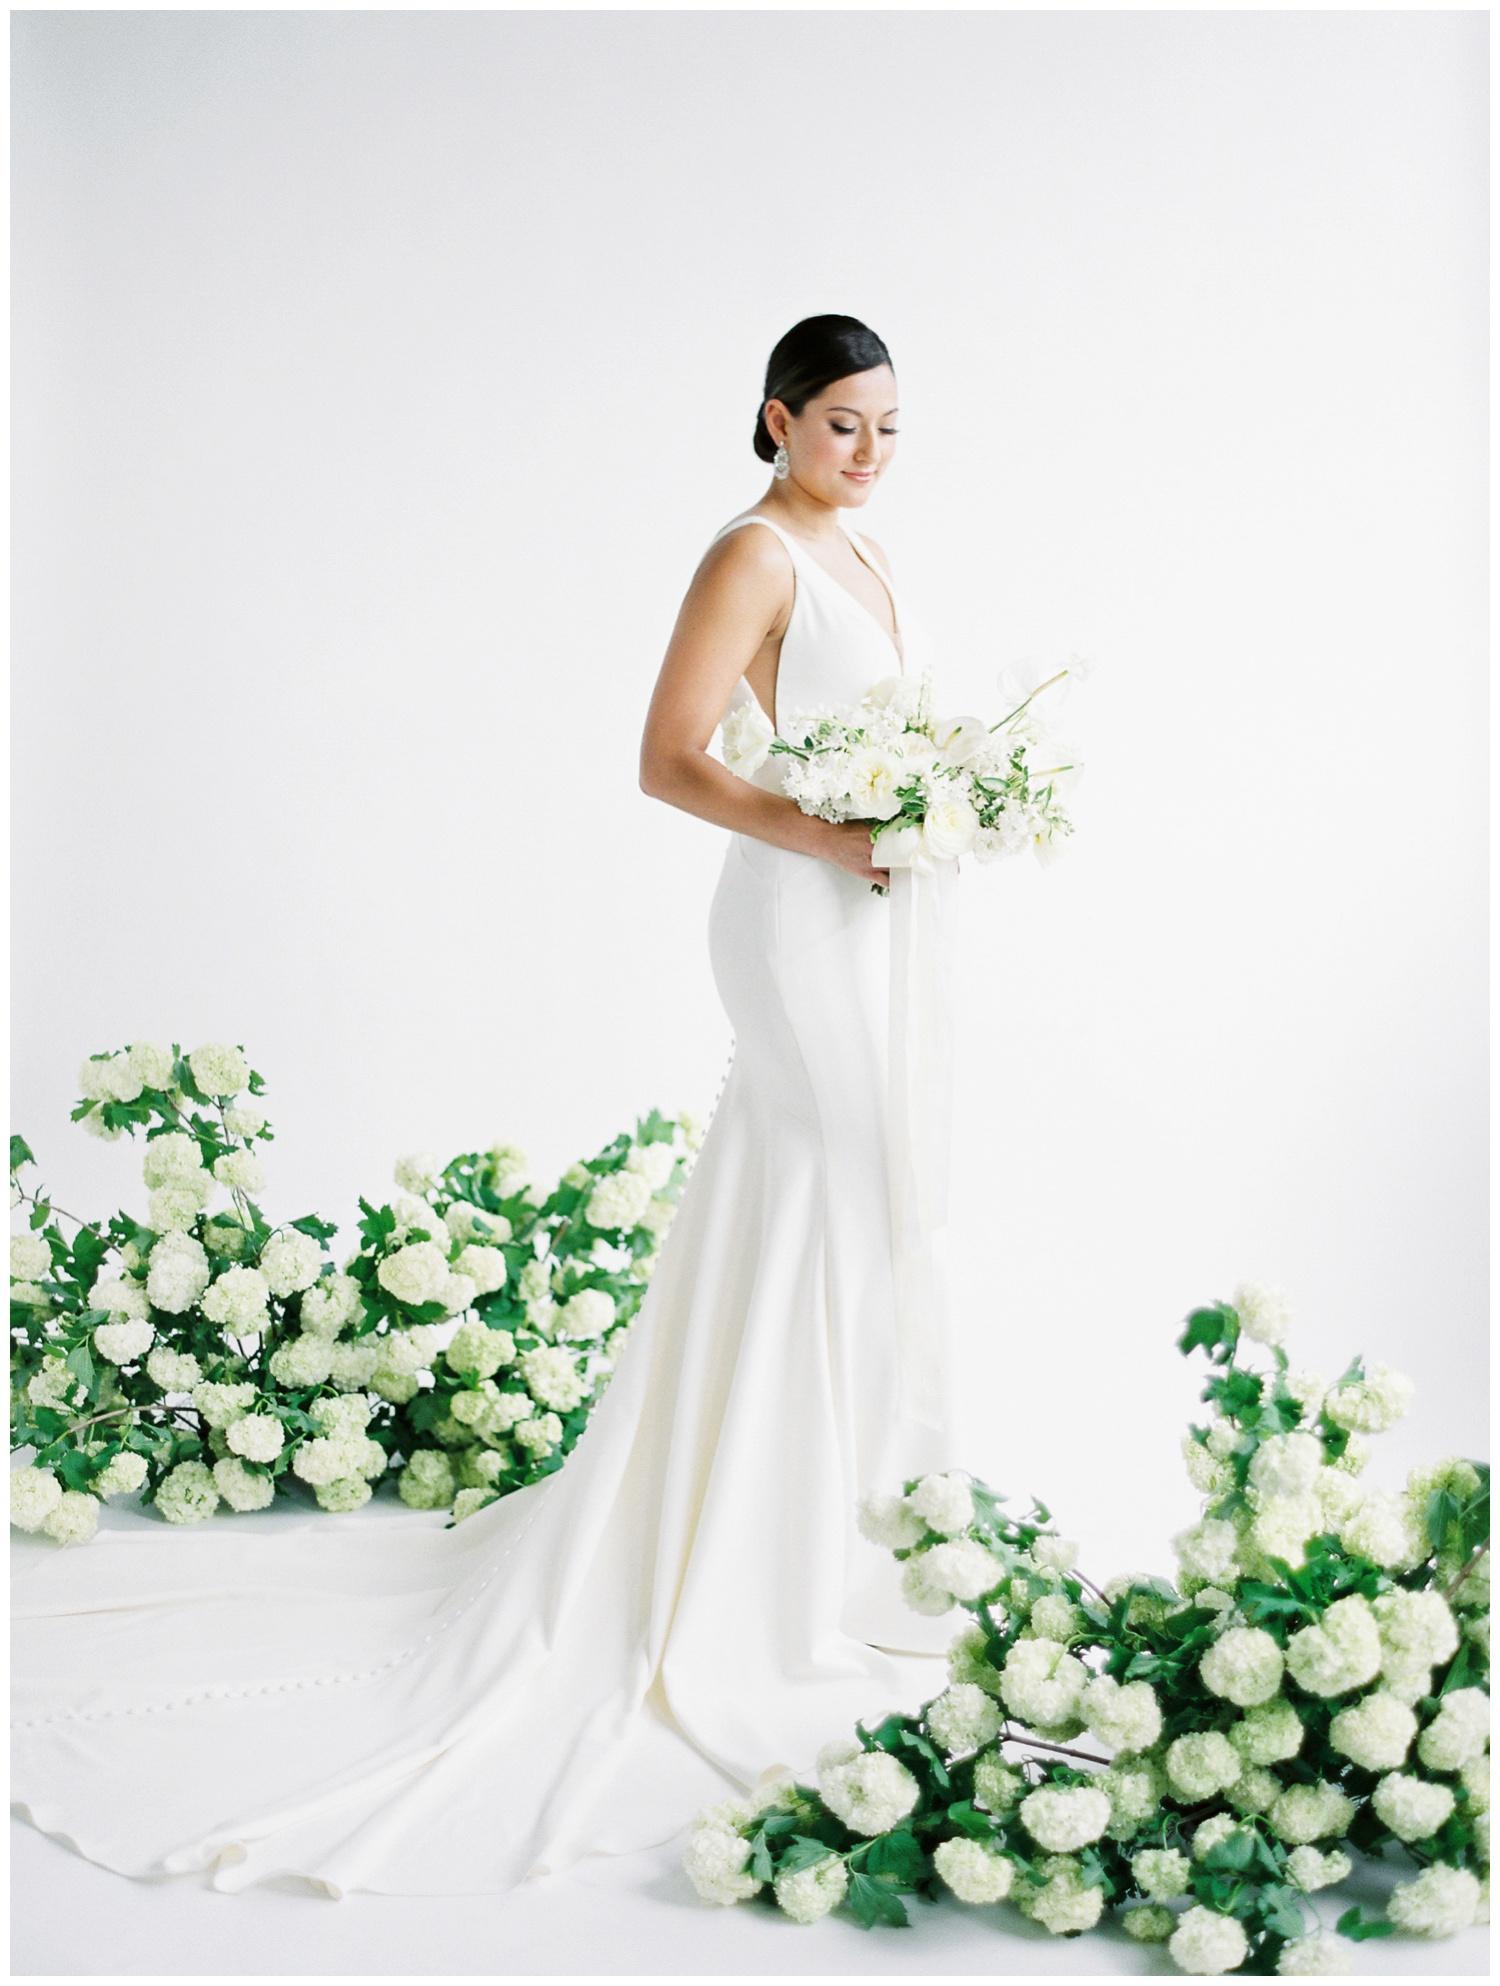 Portland_Wedding_Planner_Portland_Wedding_Florist6.jpg